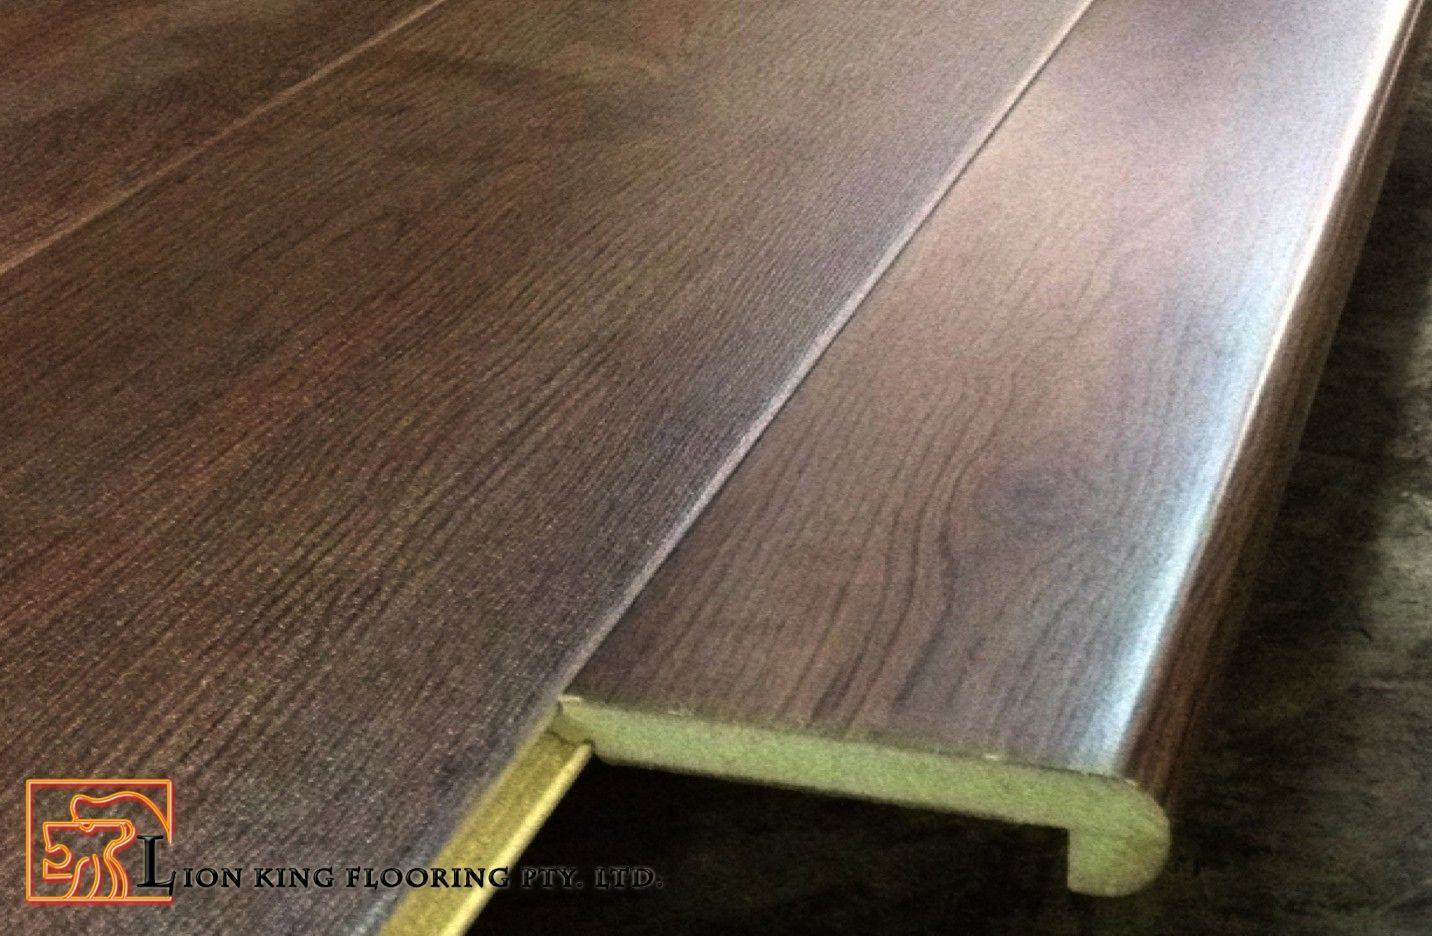 Stair Edging For Laminate Flooring Stairs Uk Floor Decoration 1432 X 936 Jpg